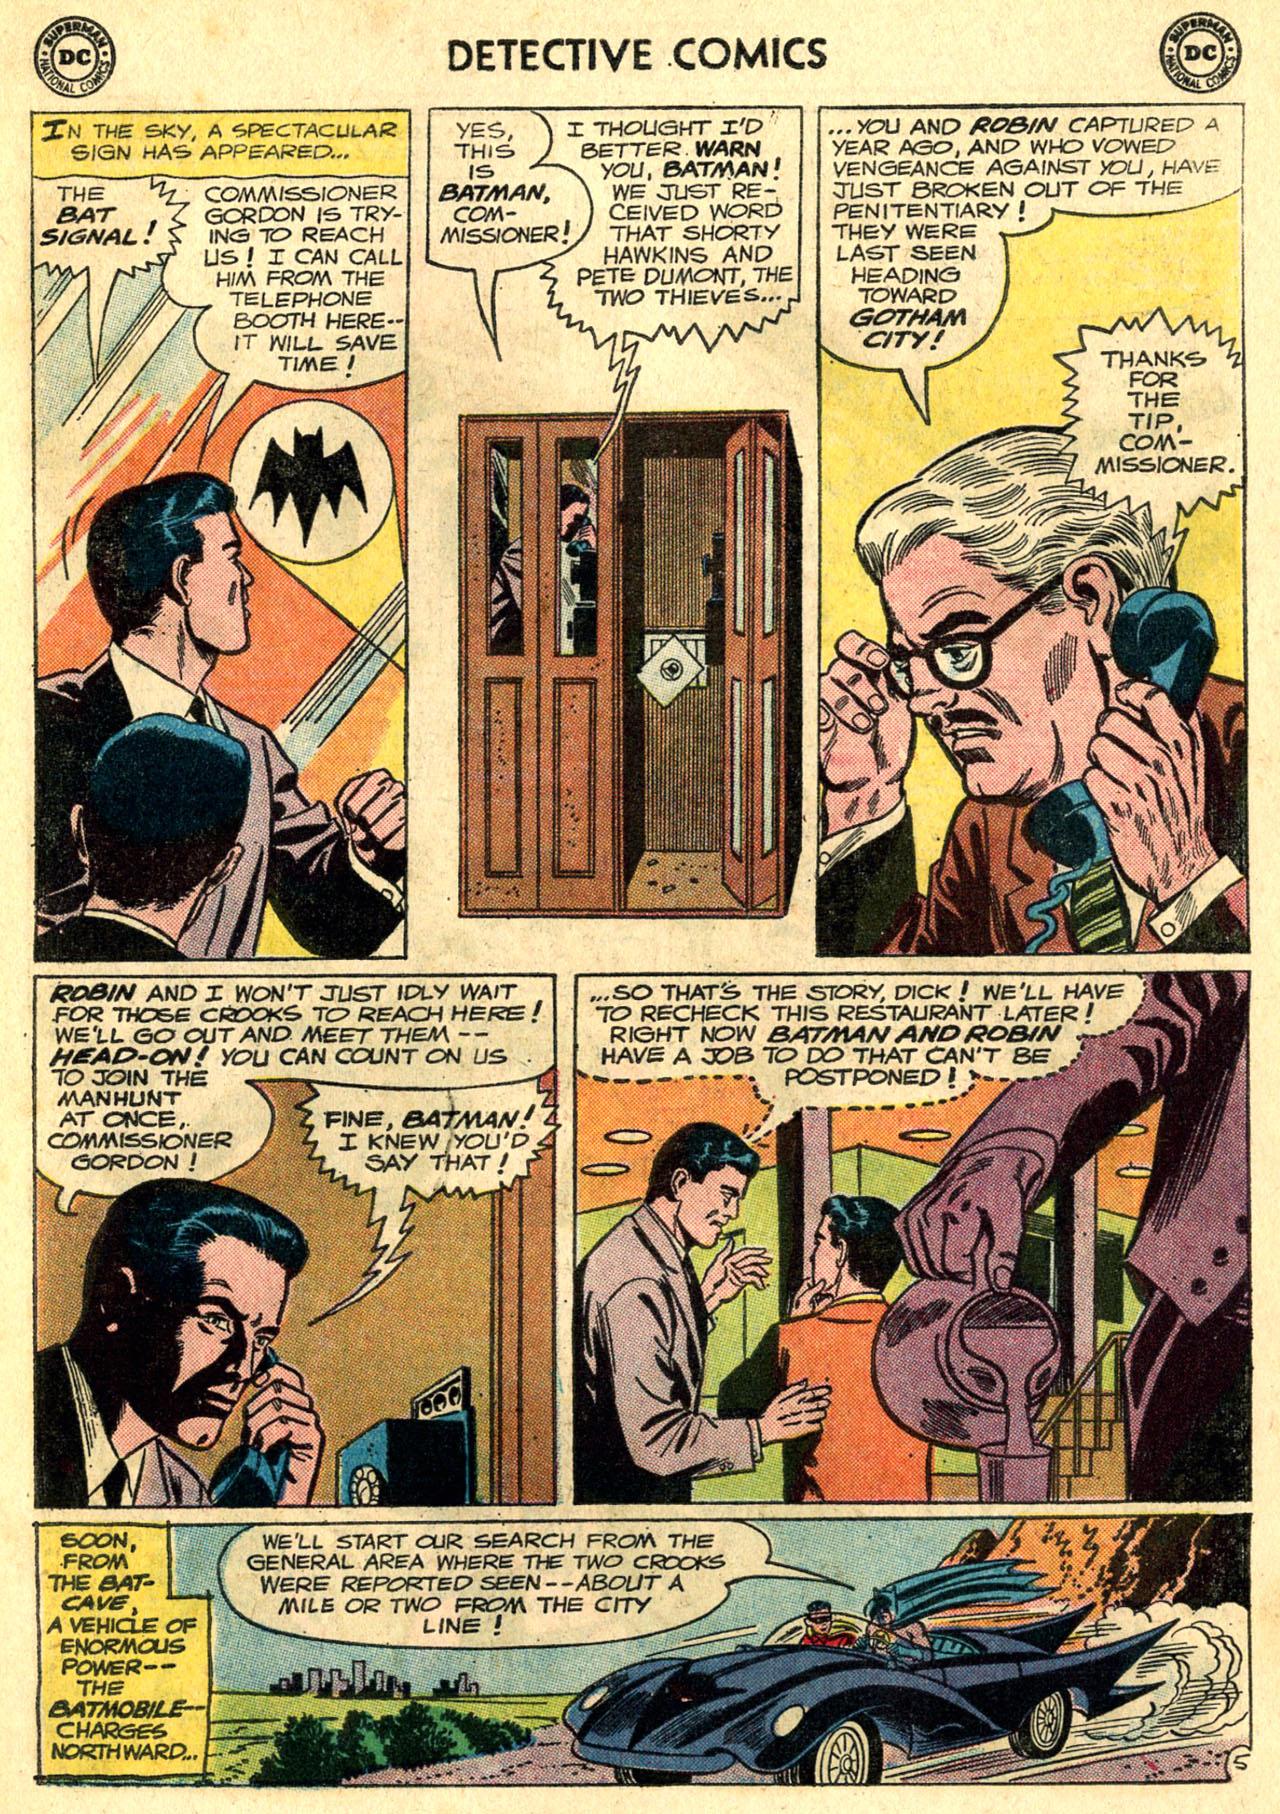 Detective Comics (1937) 330 Page 6